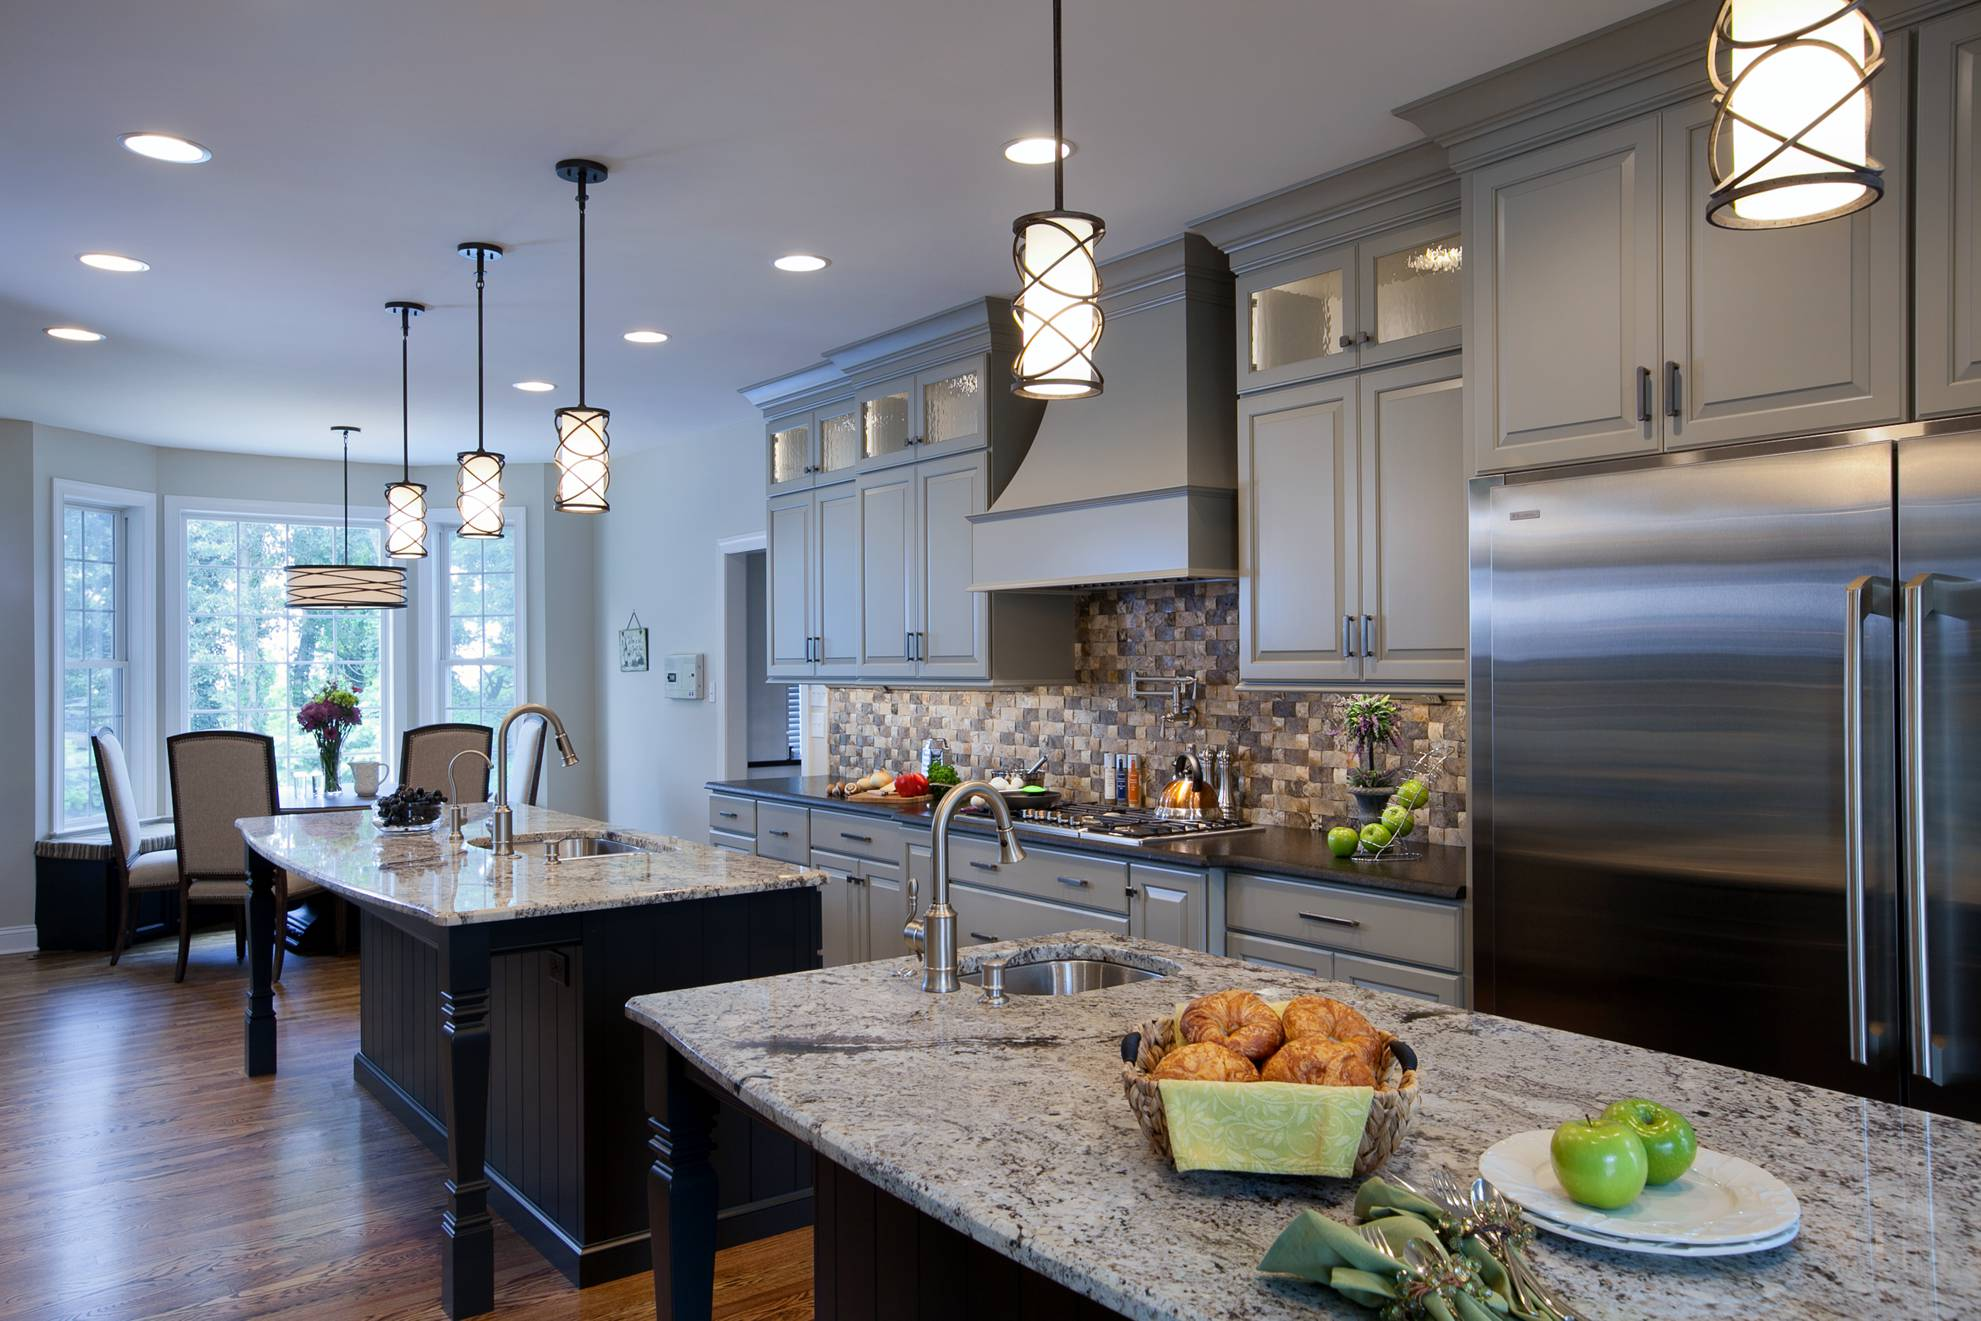 mhcustom kitchen remodeling york pa Kitchen Remodeling Kitchen Design Mother Hubbard s Custom Cabinetry